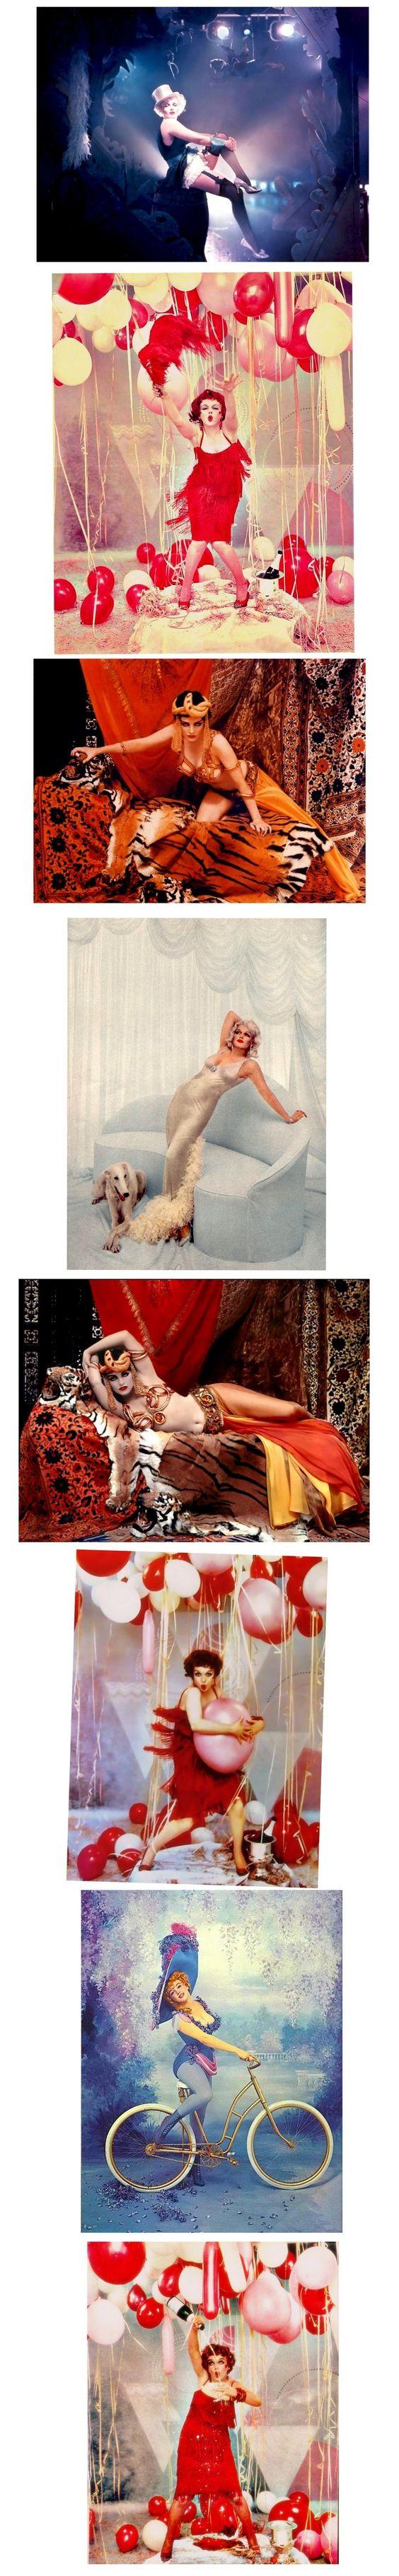 Marilyn Monroe 1958 Richard Avedon Photo Shoot. MM as Marlene Dietrich, Clara Bow, Theda Bara, Lillian Russell and Jean Harlow